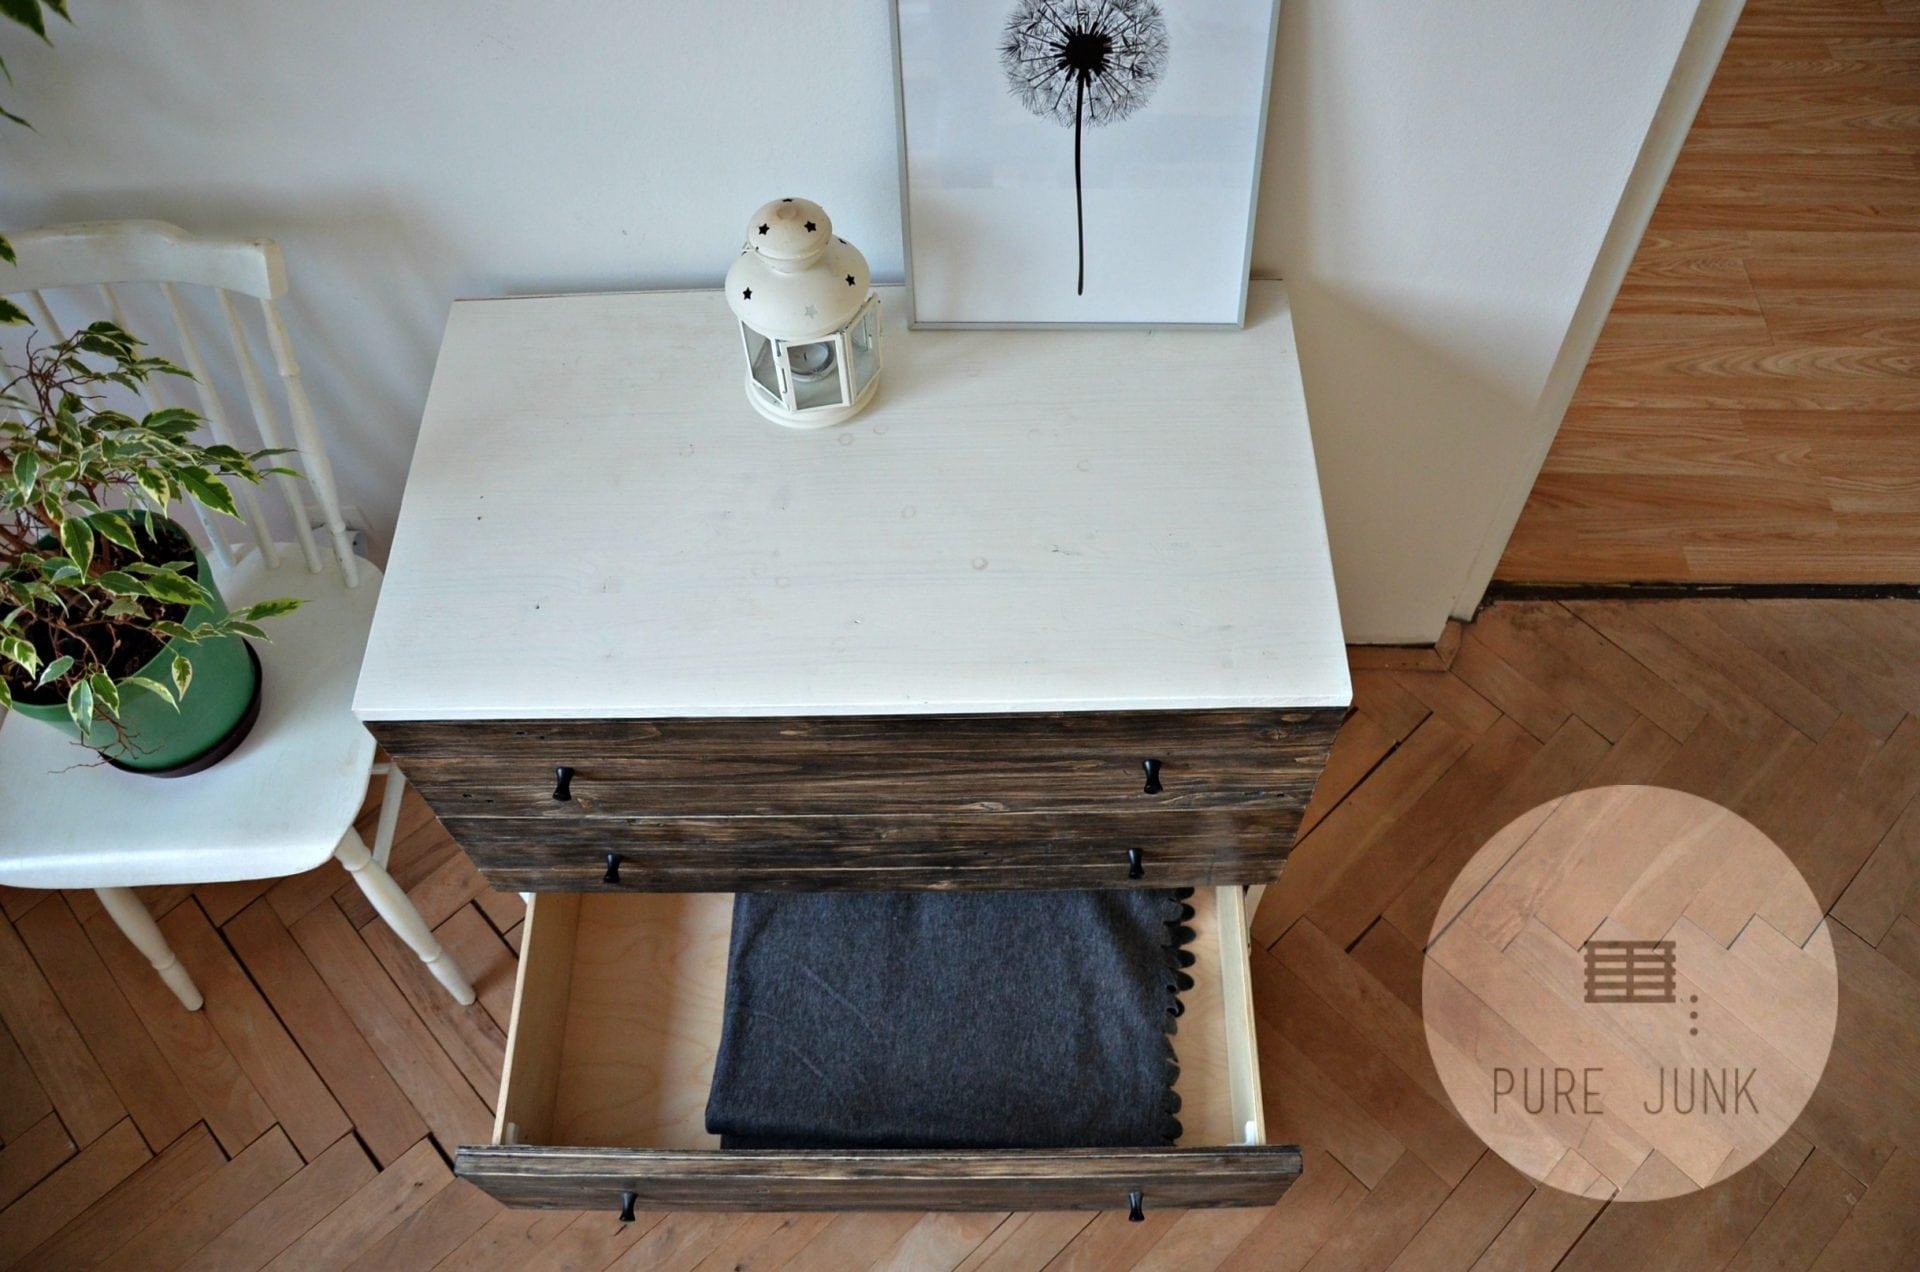 purejunk-meni-stare-drevo-na-stylove-produkty